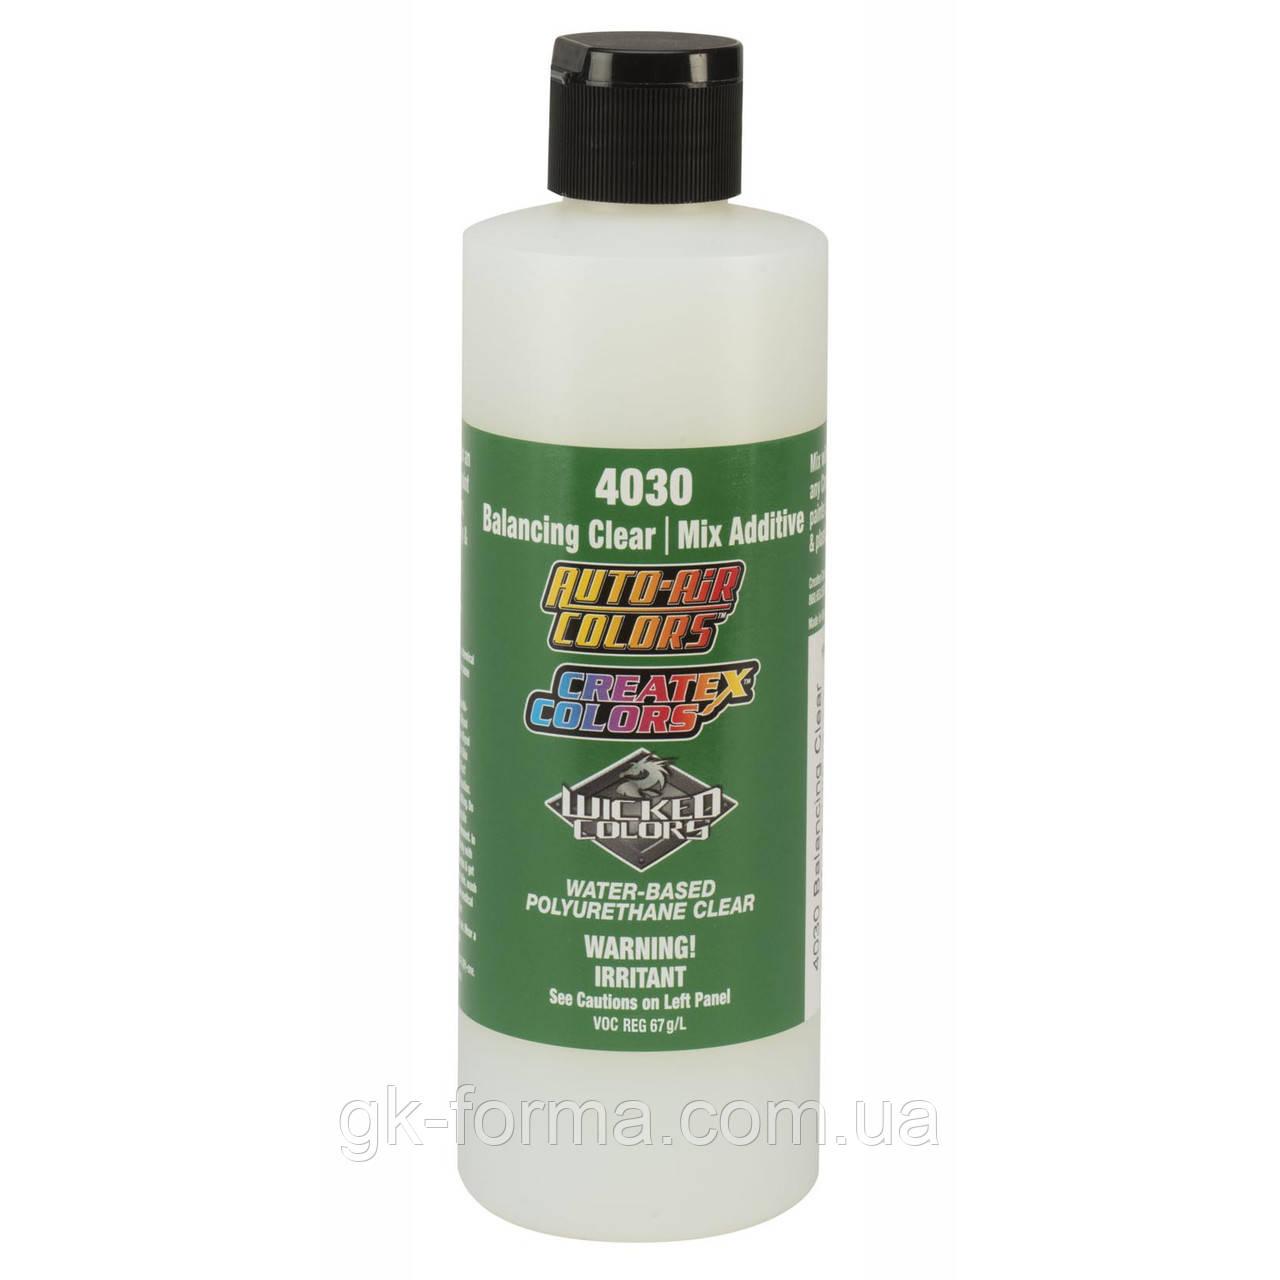 Уретановая добавка для красокCreatex 4030 Balancing Clear, 60 мл